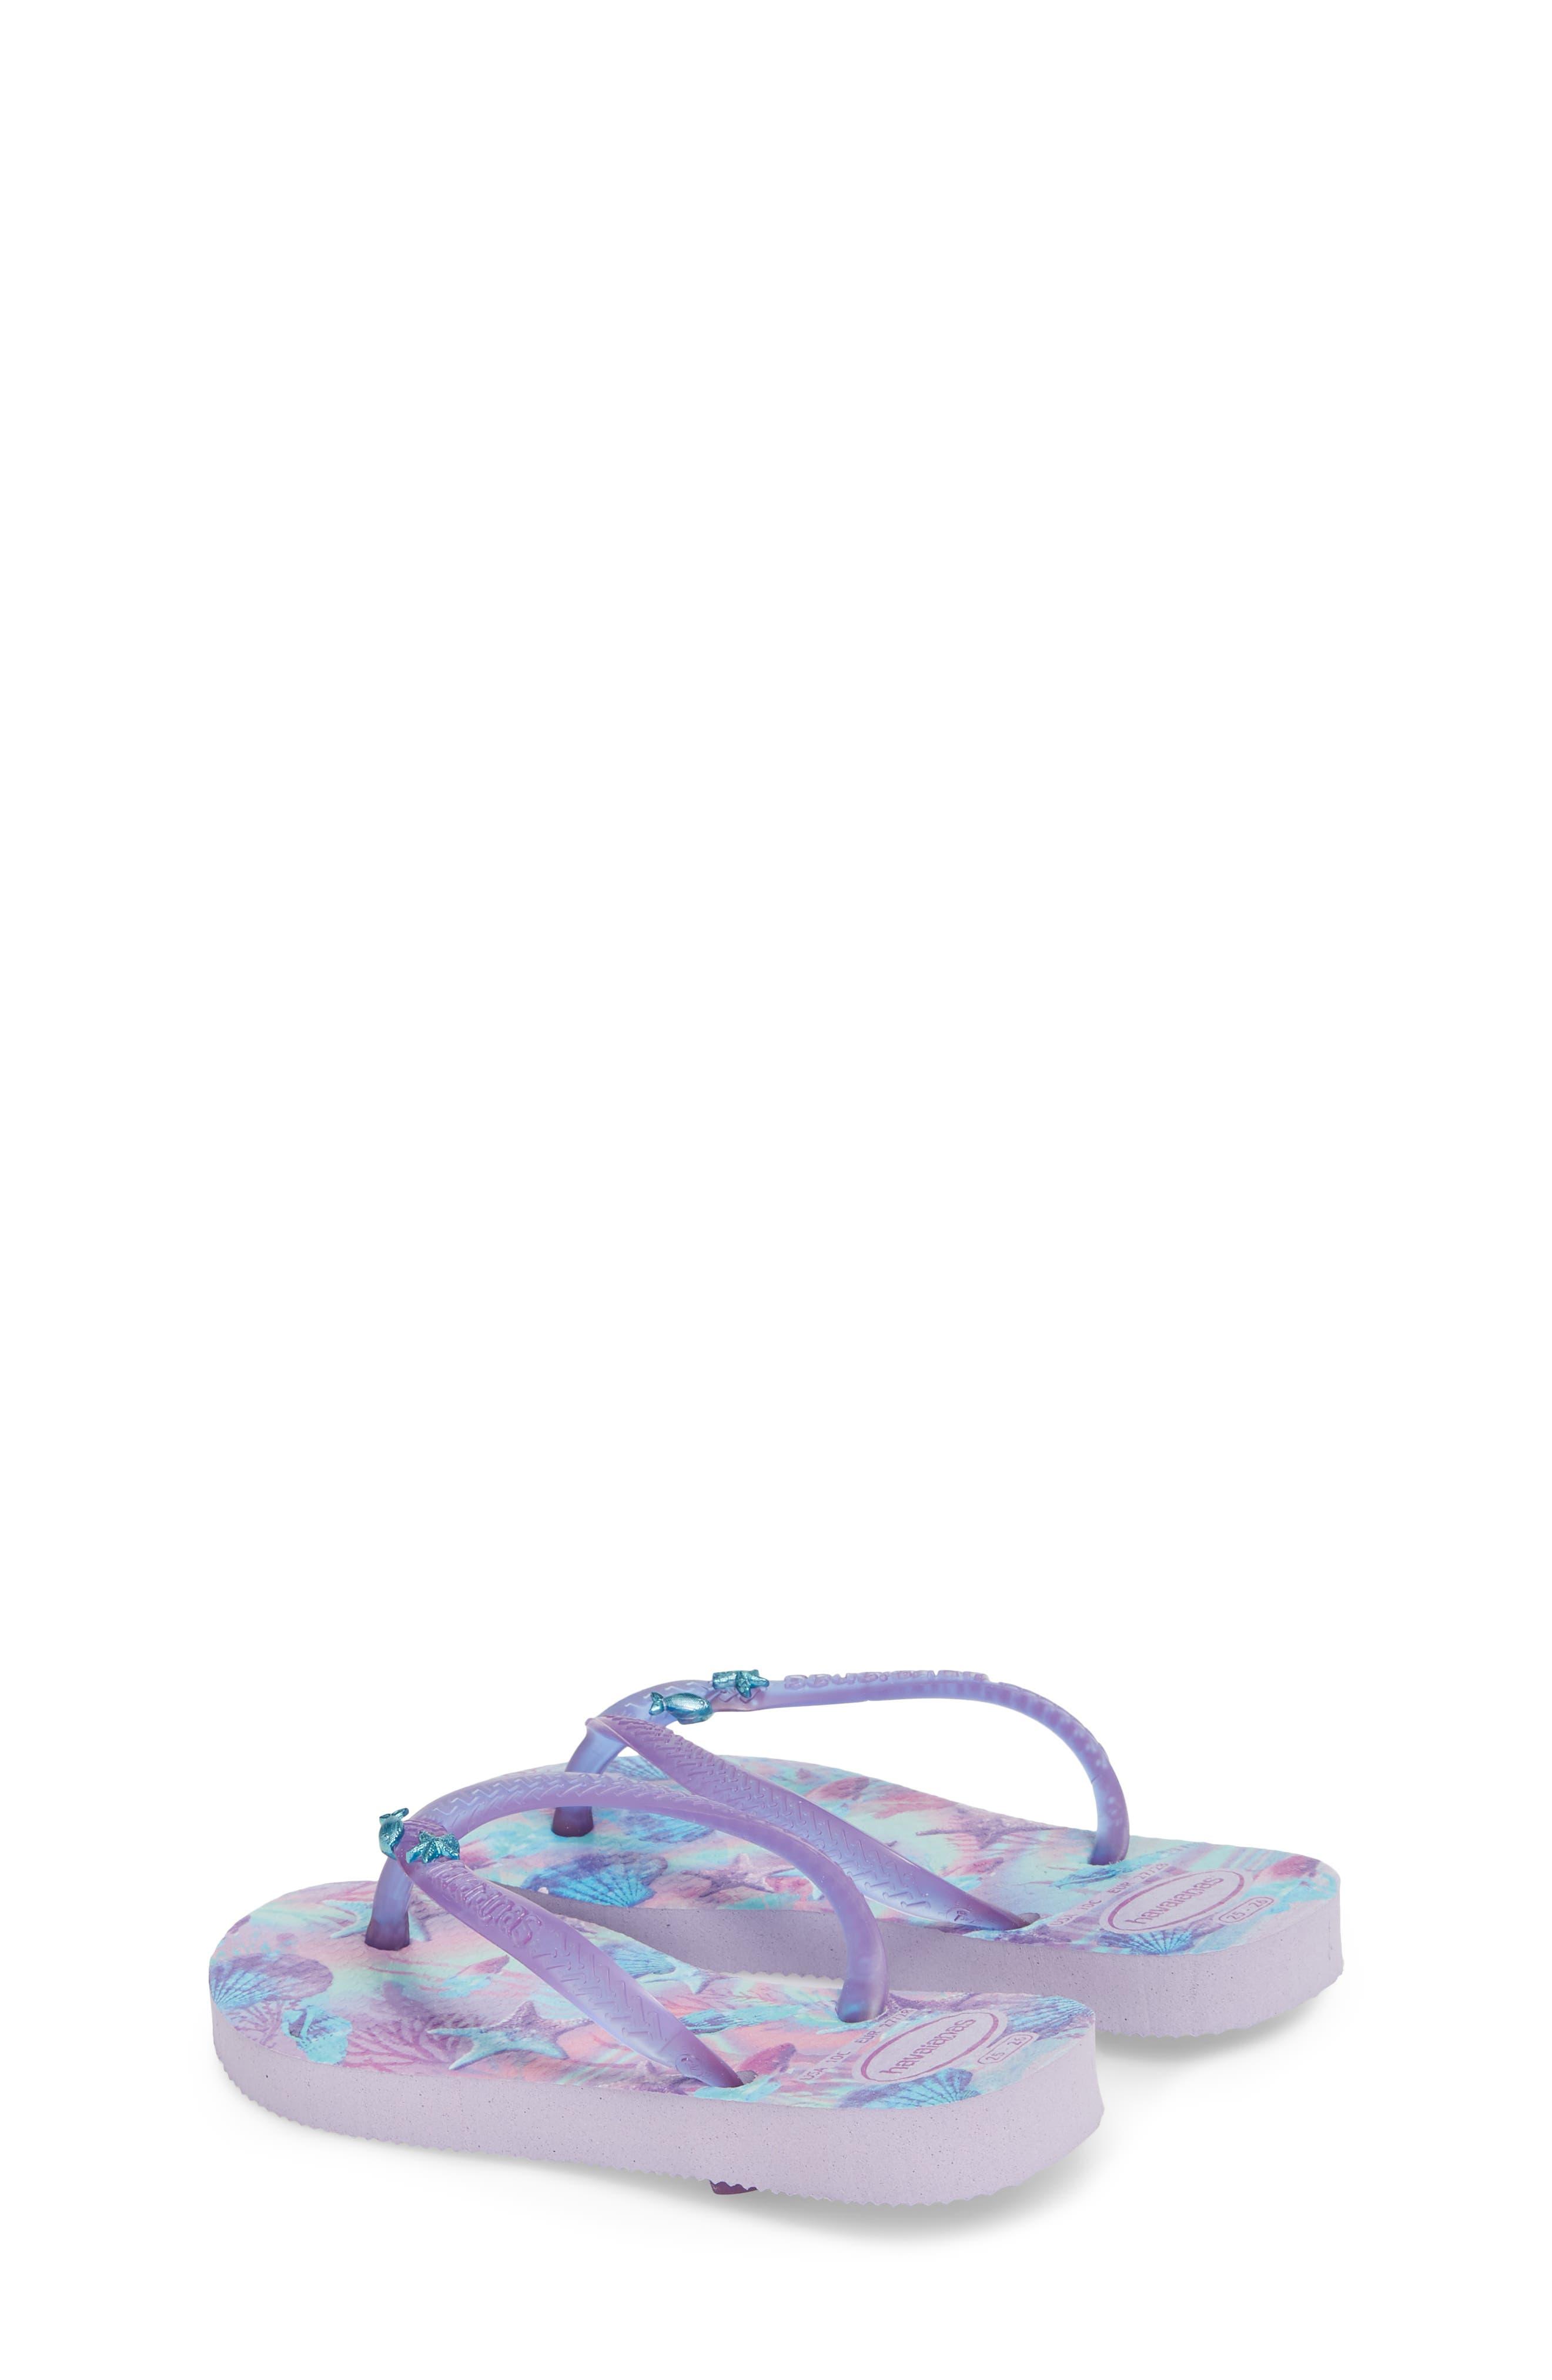 Havianas Slim Summer Flip Flop,                             Alternate thumbnail 2, color,                             Lavender